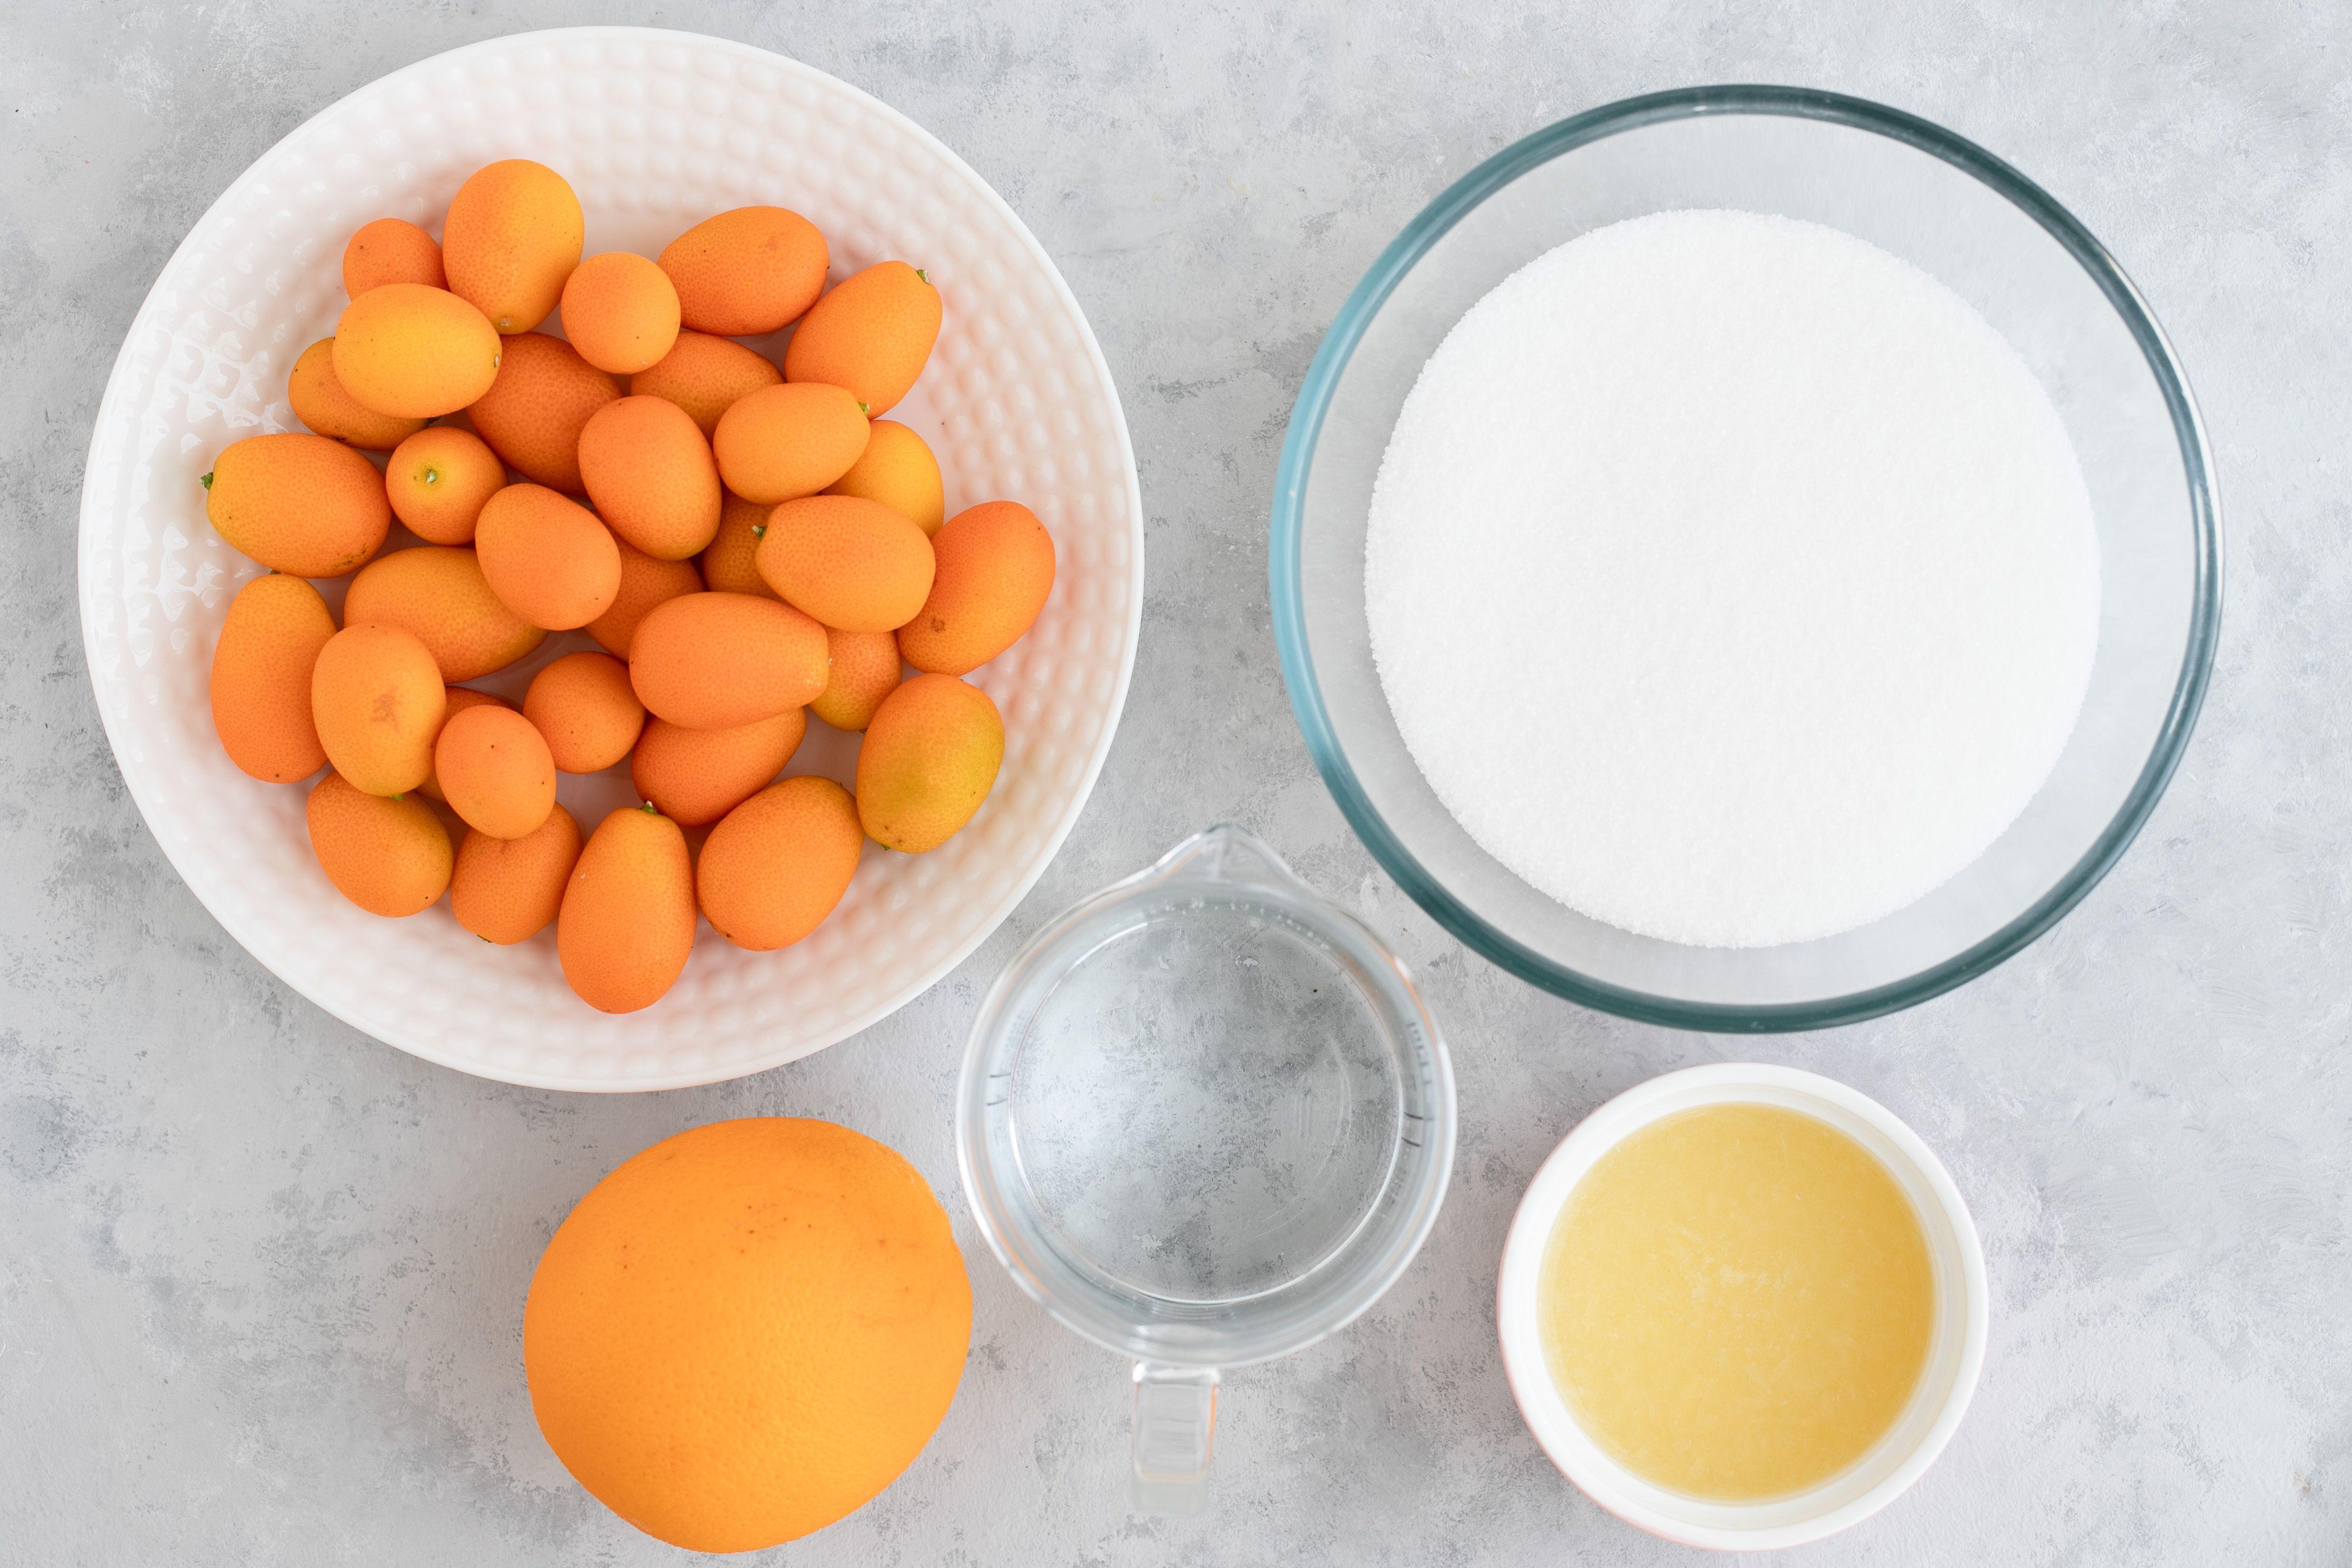 Ingredients for kumquat marmalade